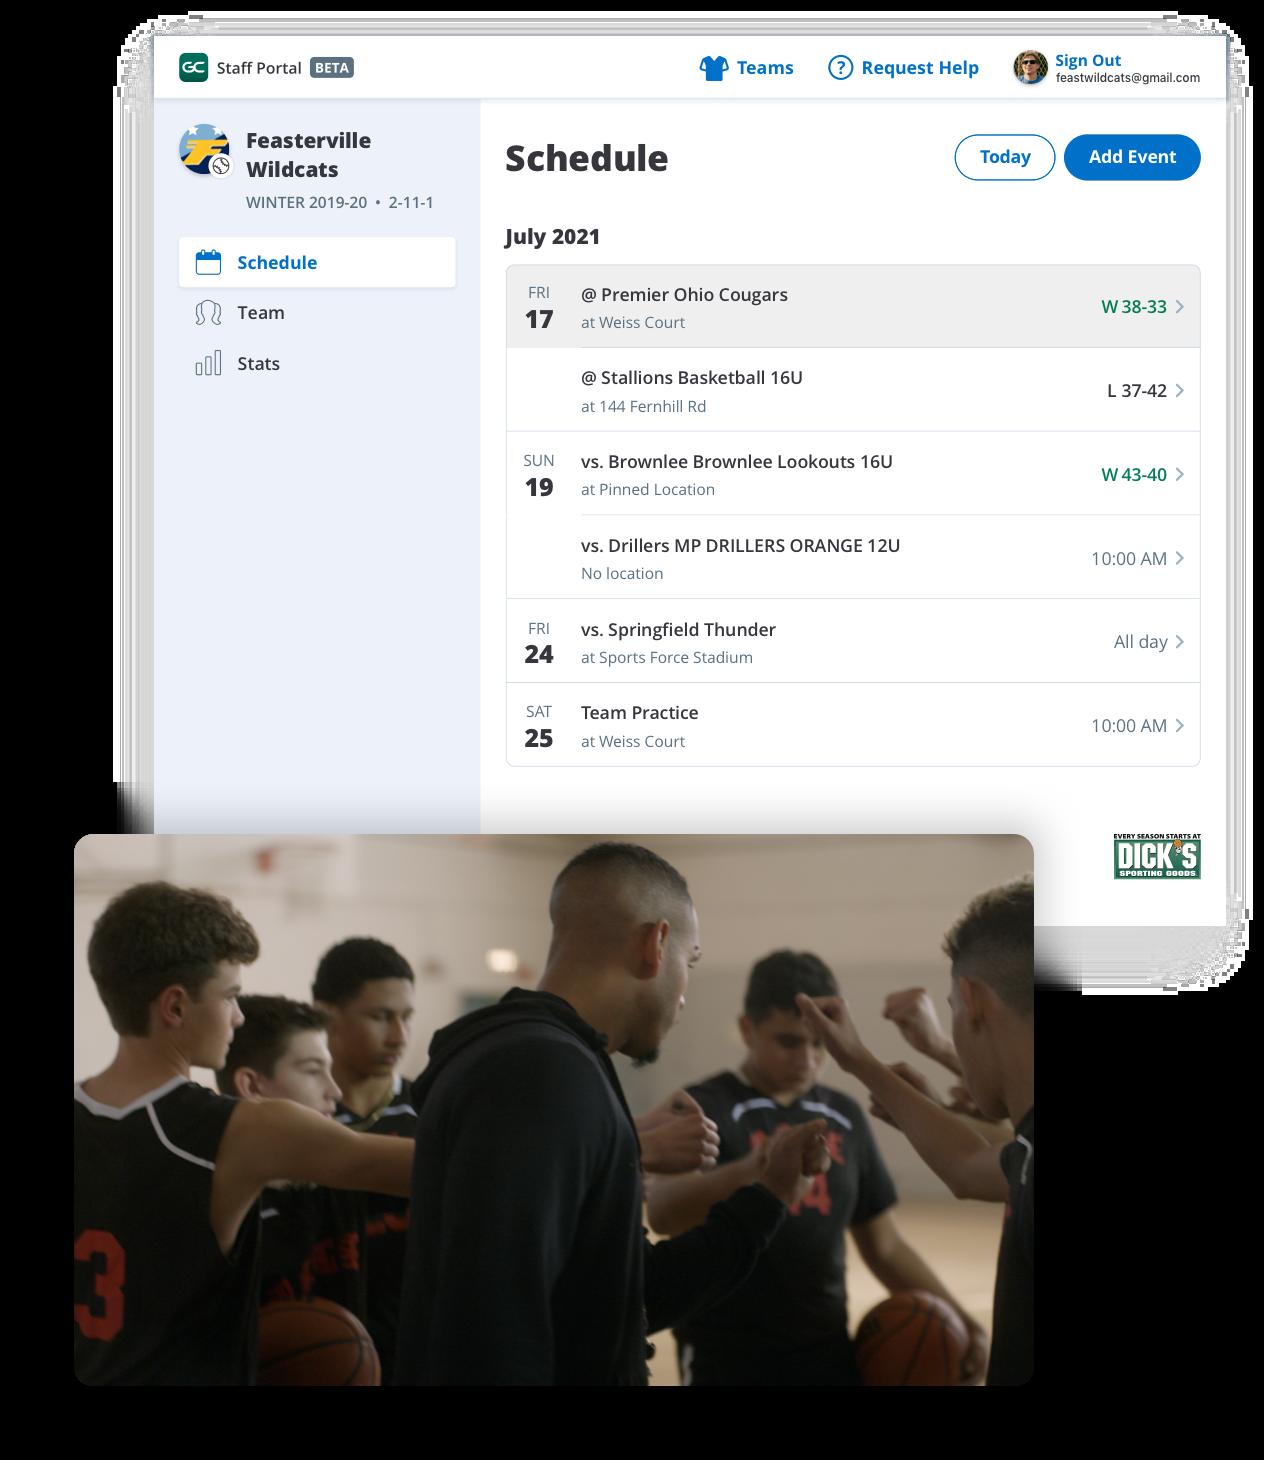 GameChanger Team Manager web portal for basketball team, schedule